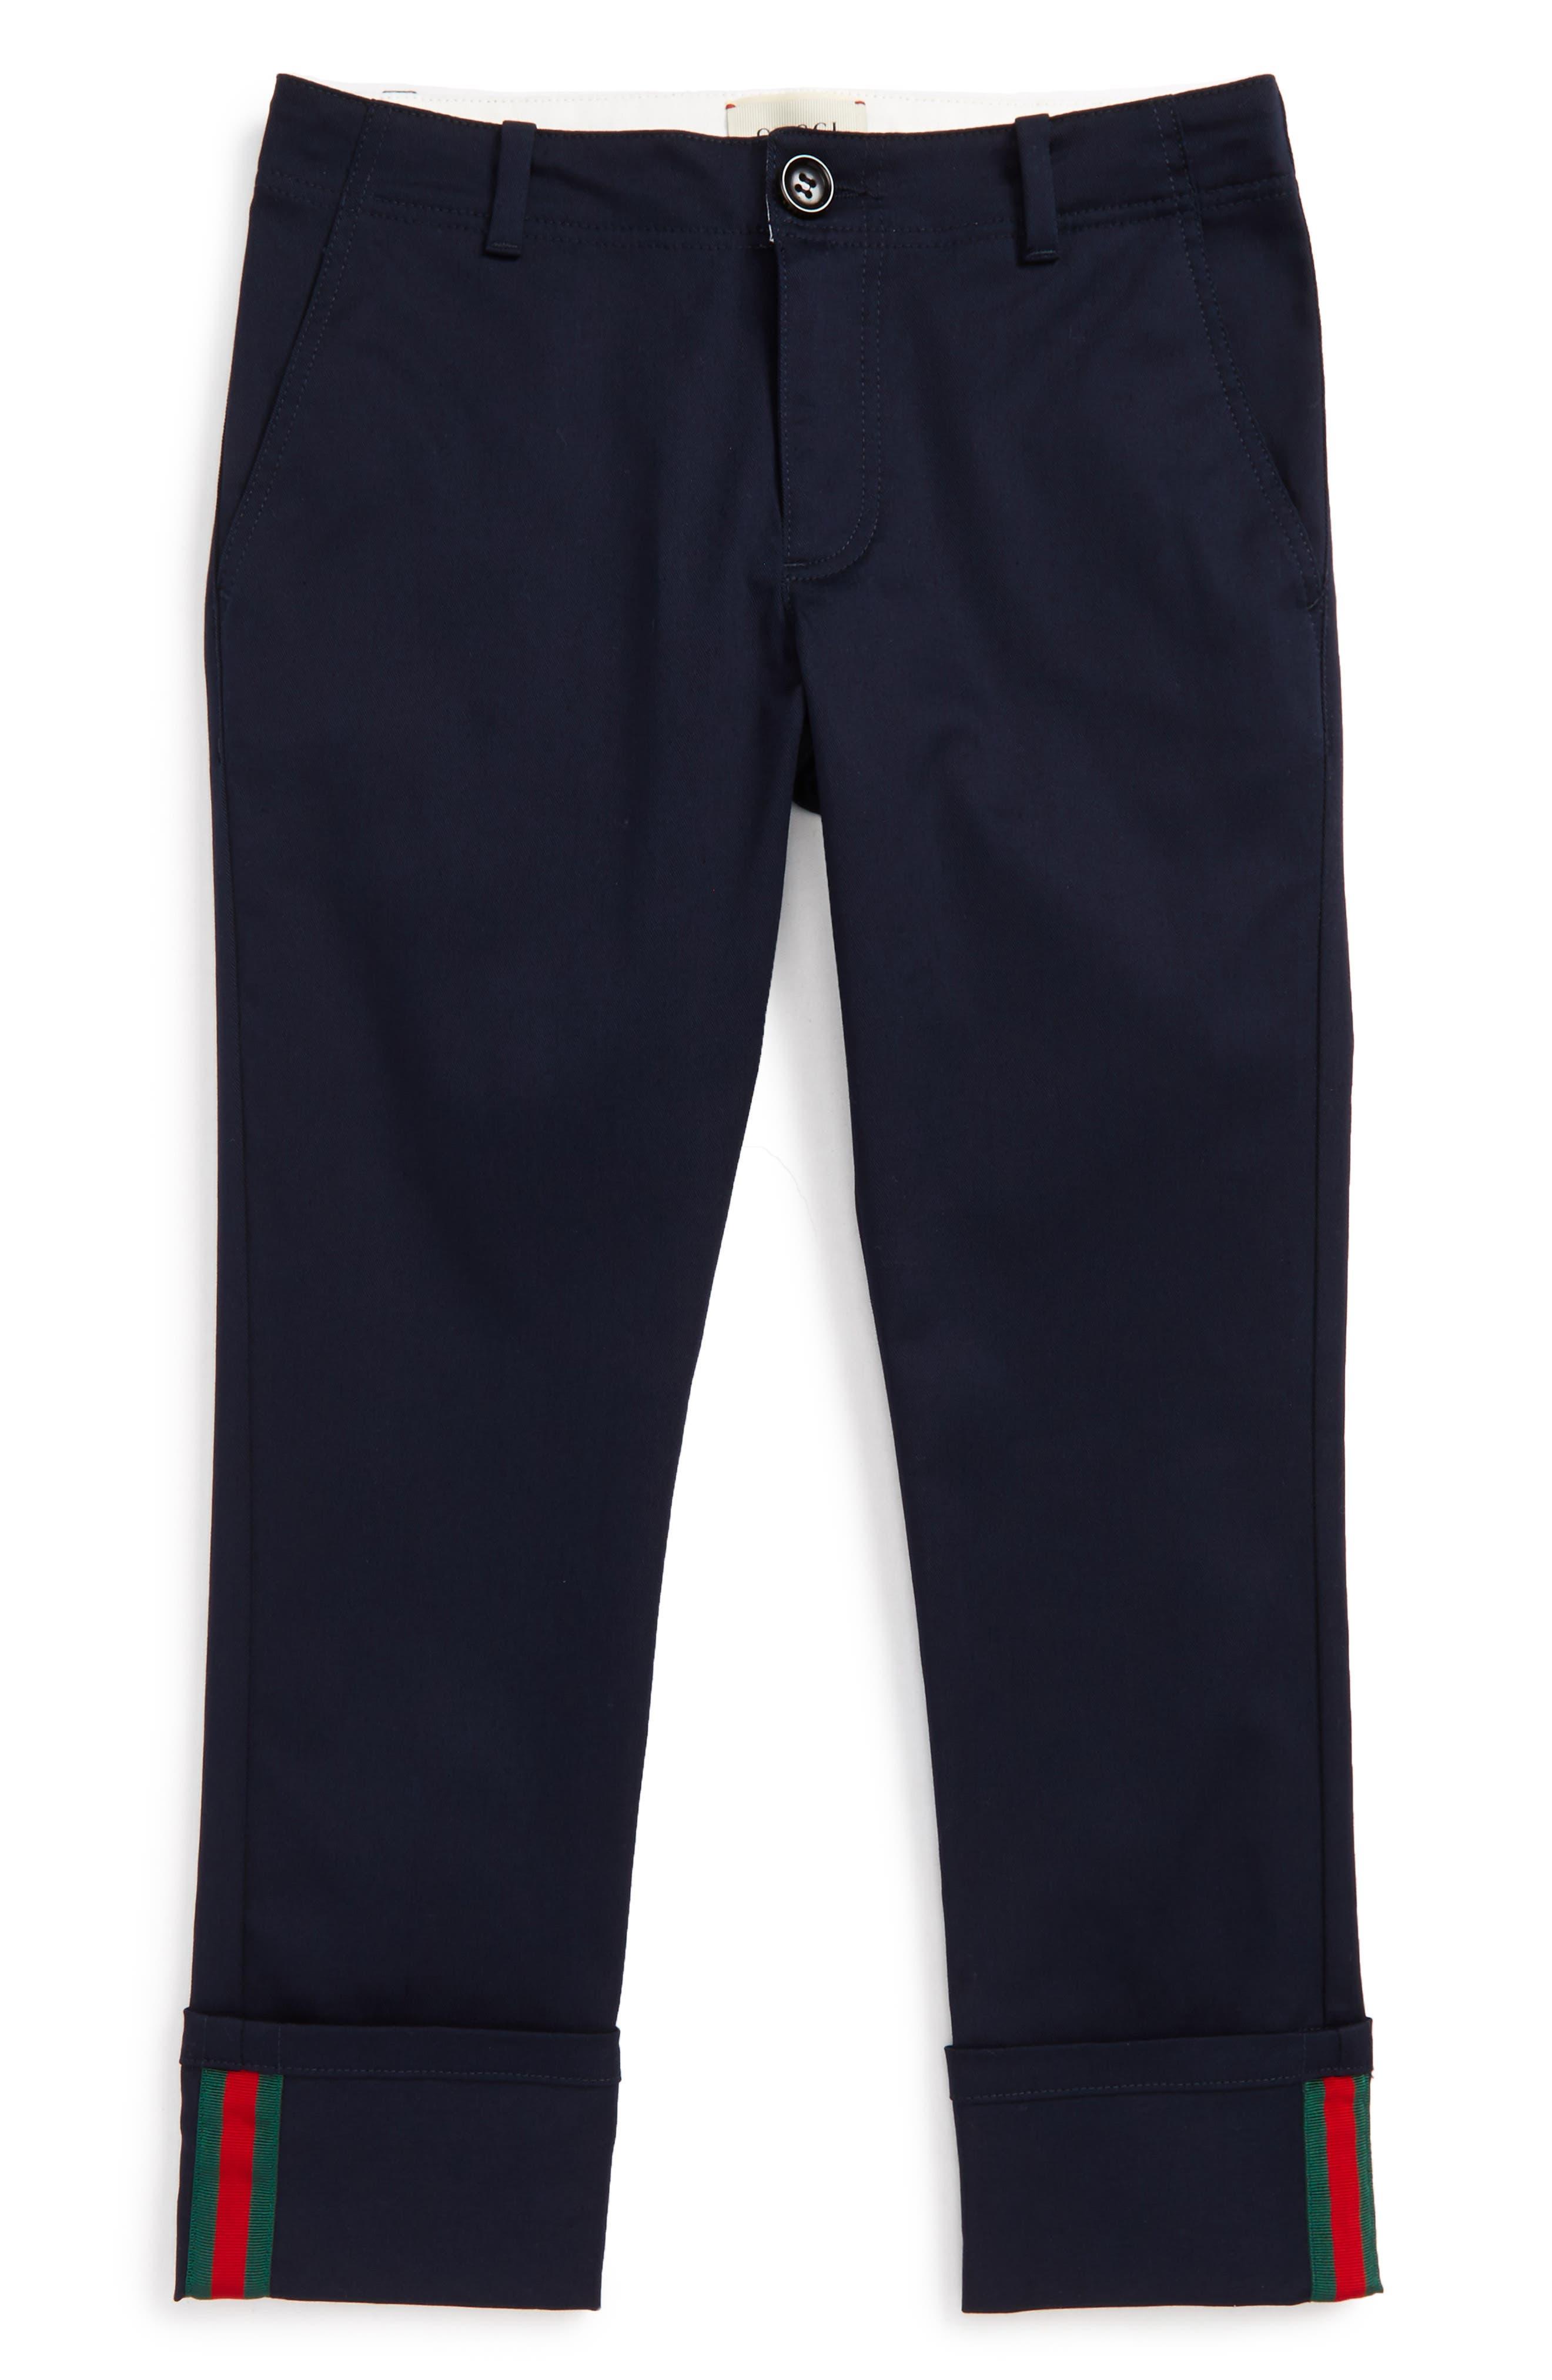 Main Image - Gucci Urban Stripe Pants (Little Boys & Big Boys)